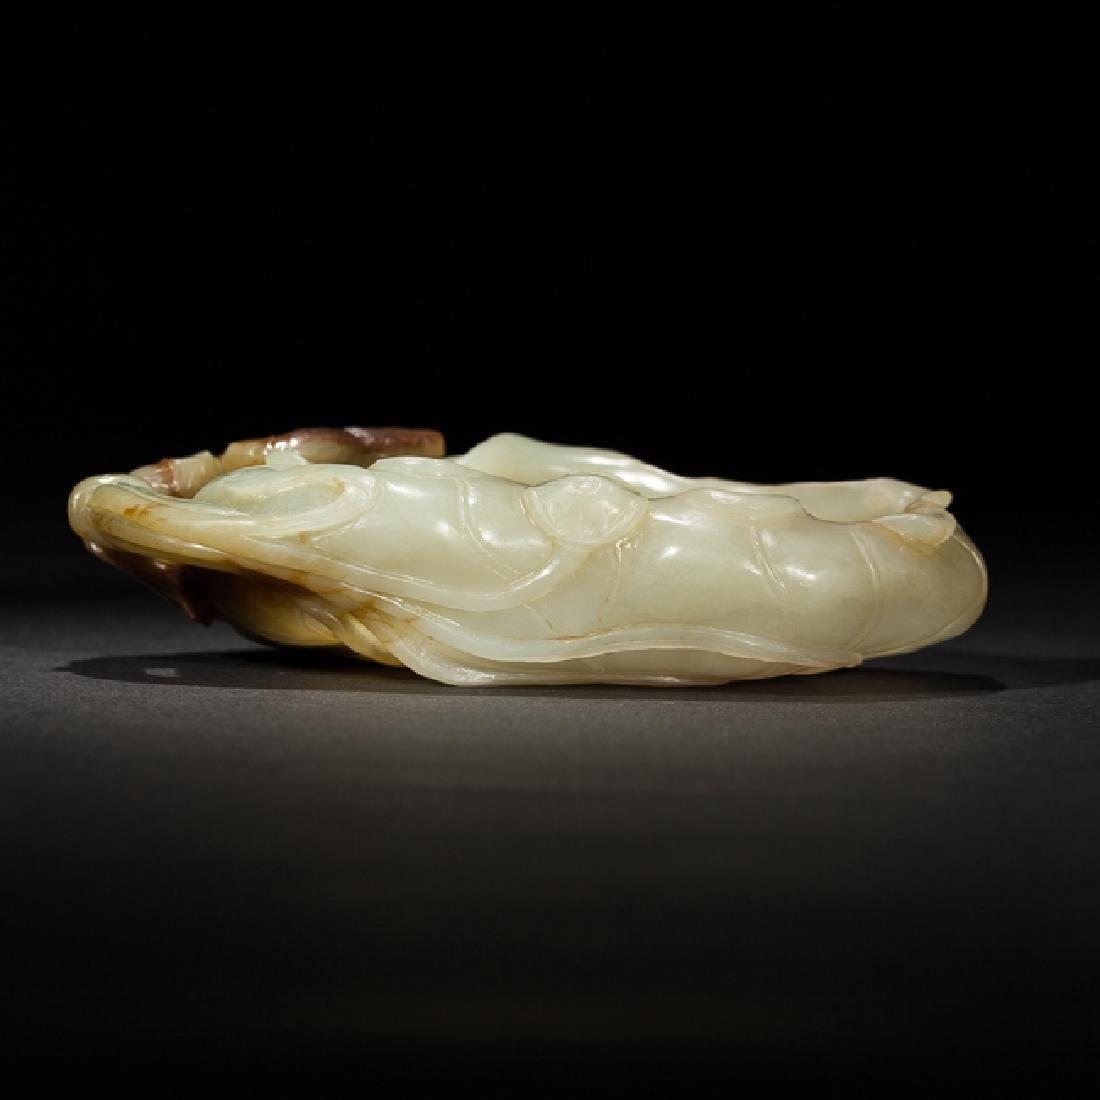 Chinese Antique Celadon Jade Brush Washer, 19th Century - 3